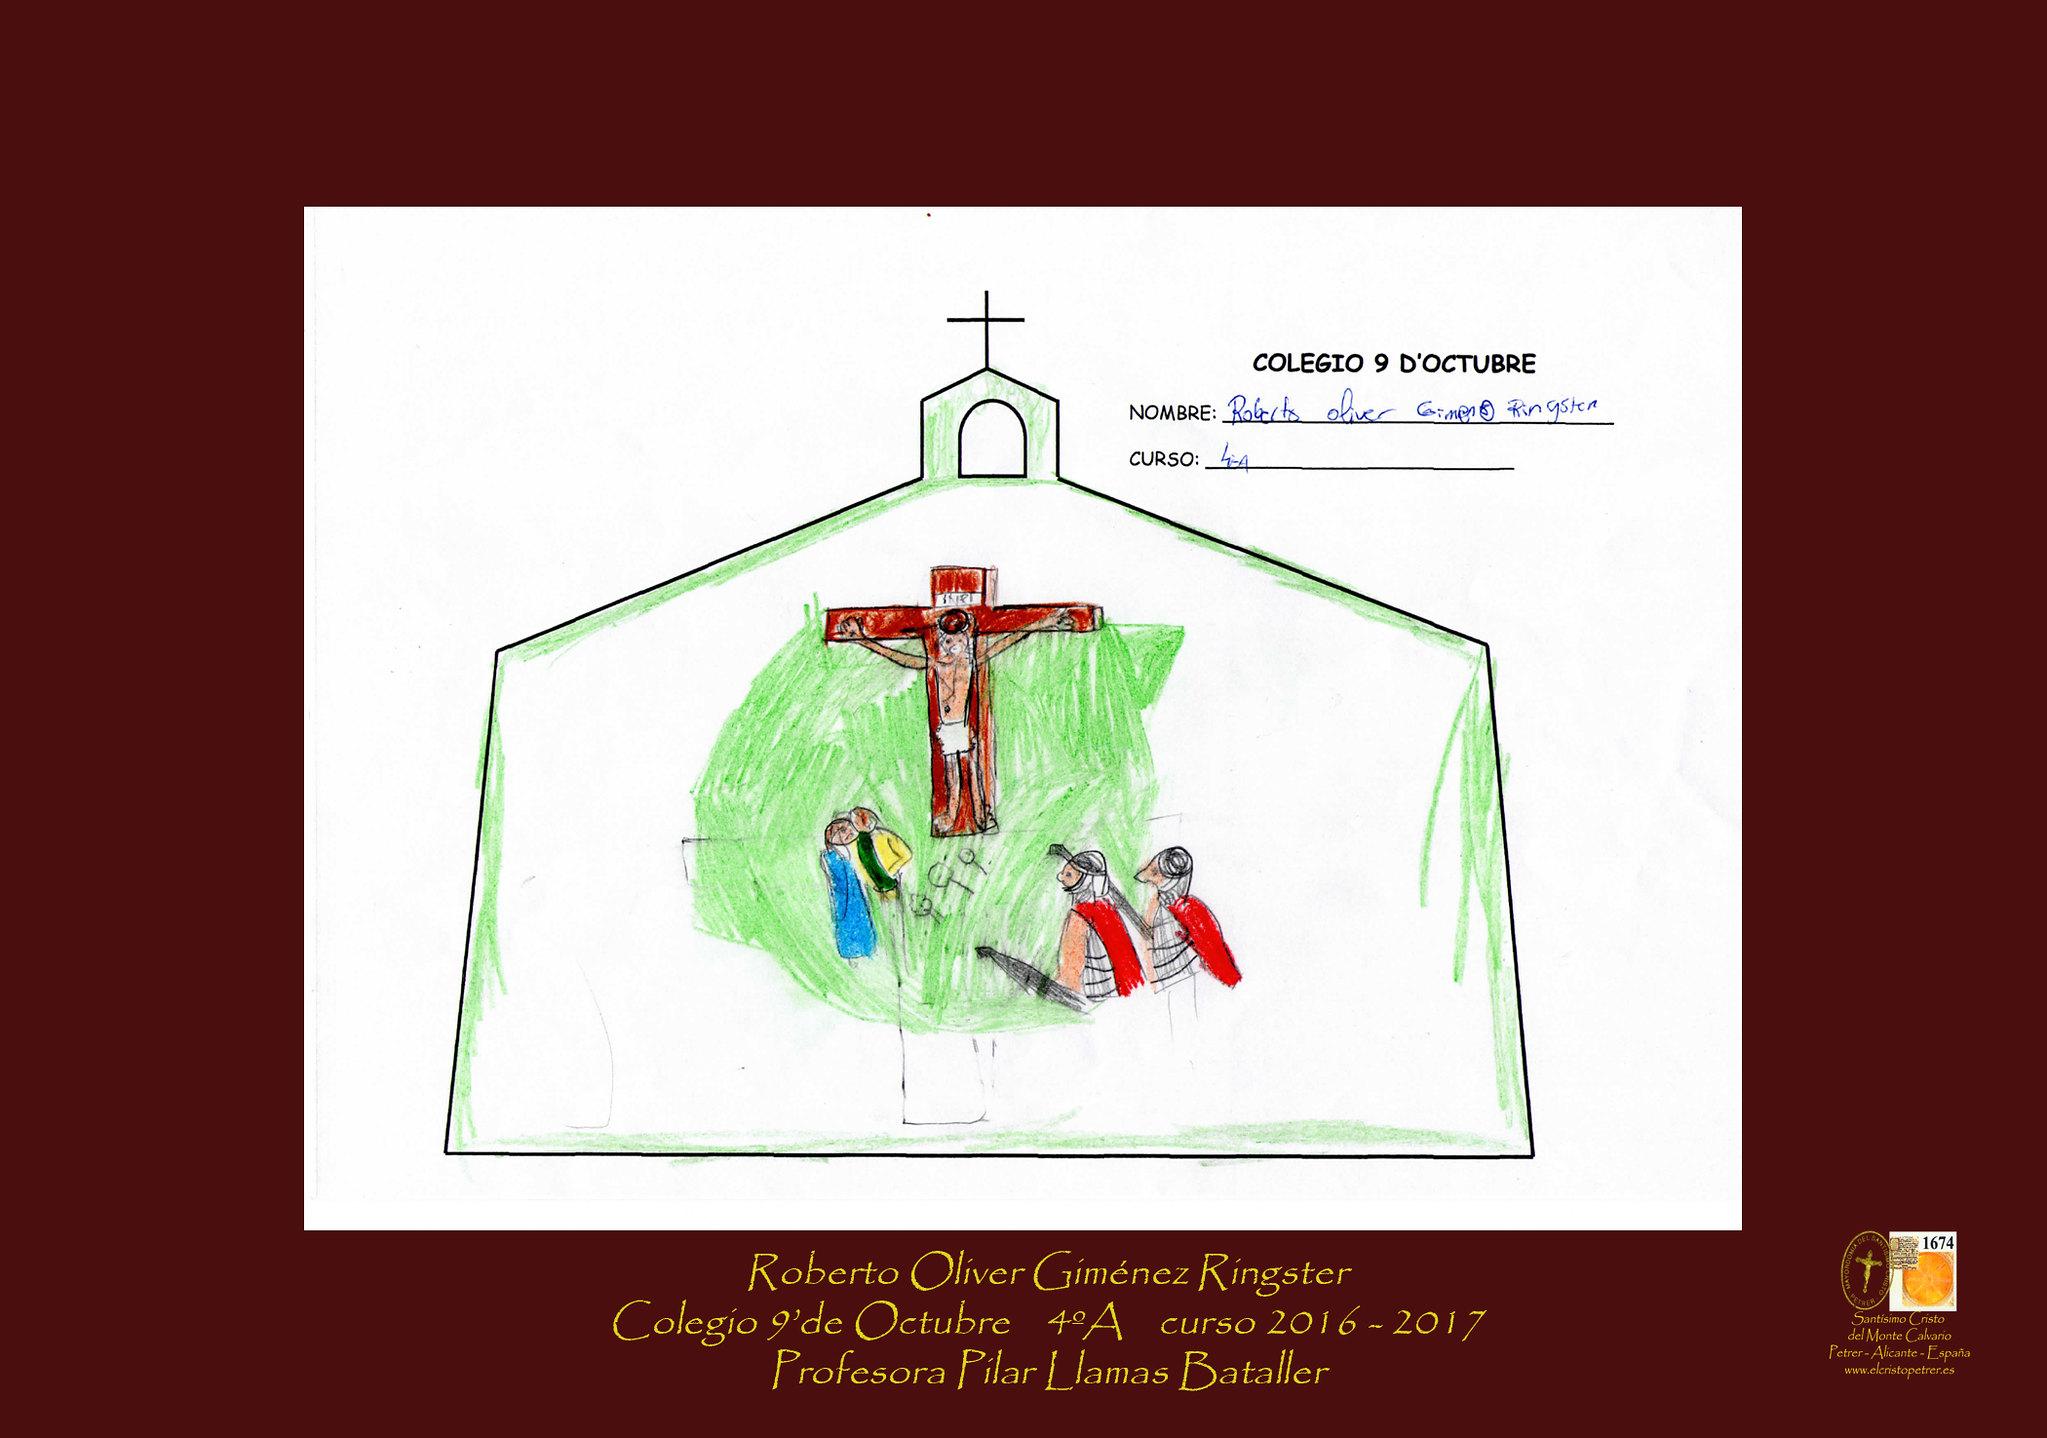 ElCristo - Actos - Exposicion Fotografica - (2017-12-01) - 9 D'Octubre - 4ºA - Giménez Ringster, Roberto Oliver